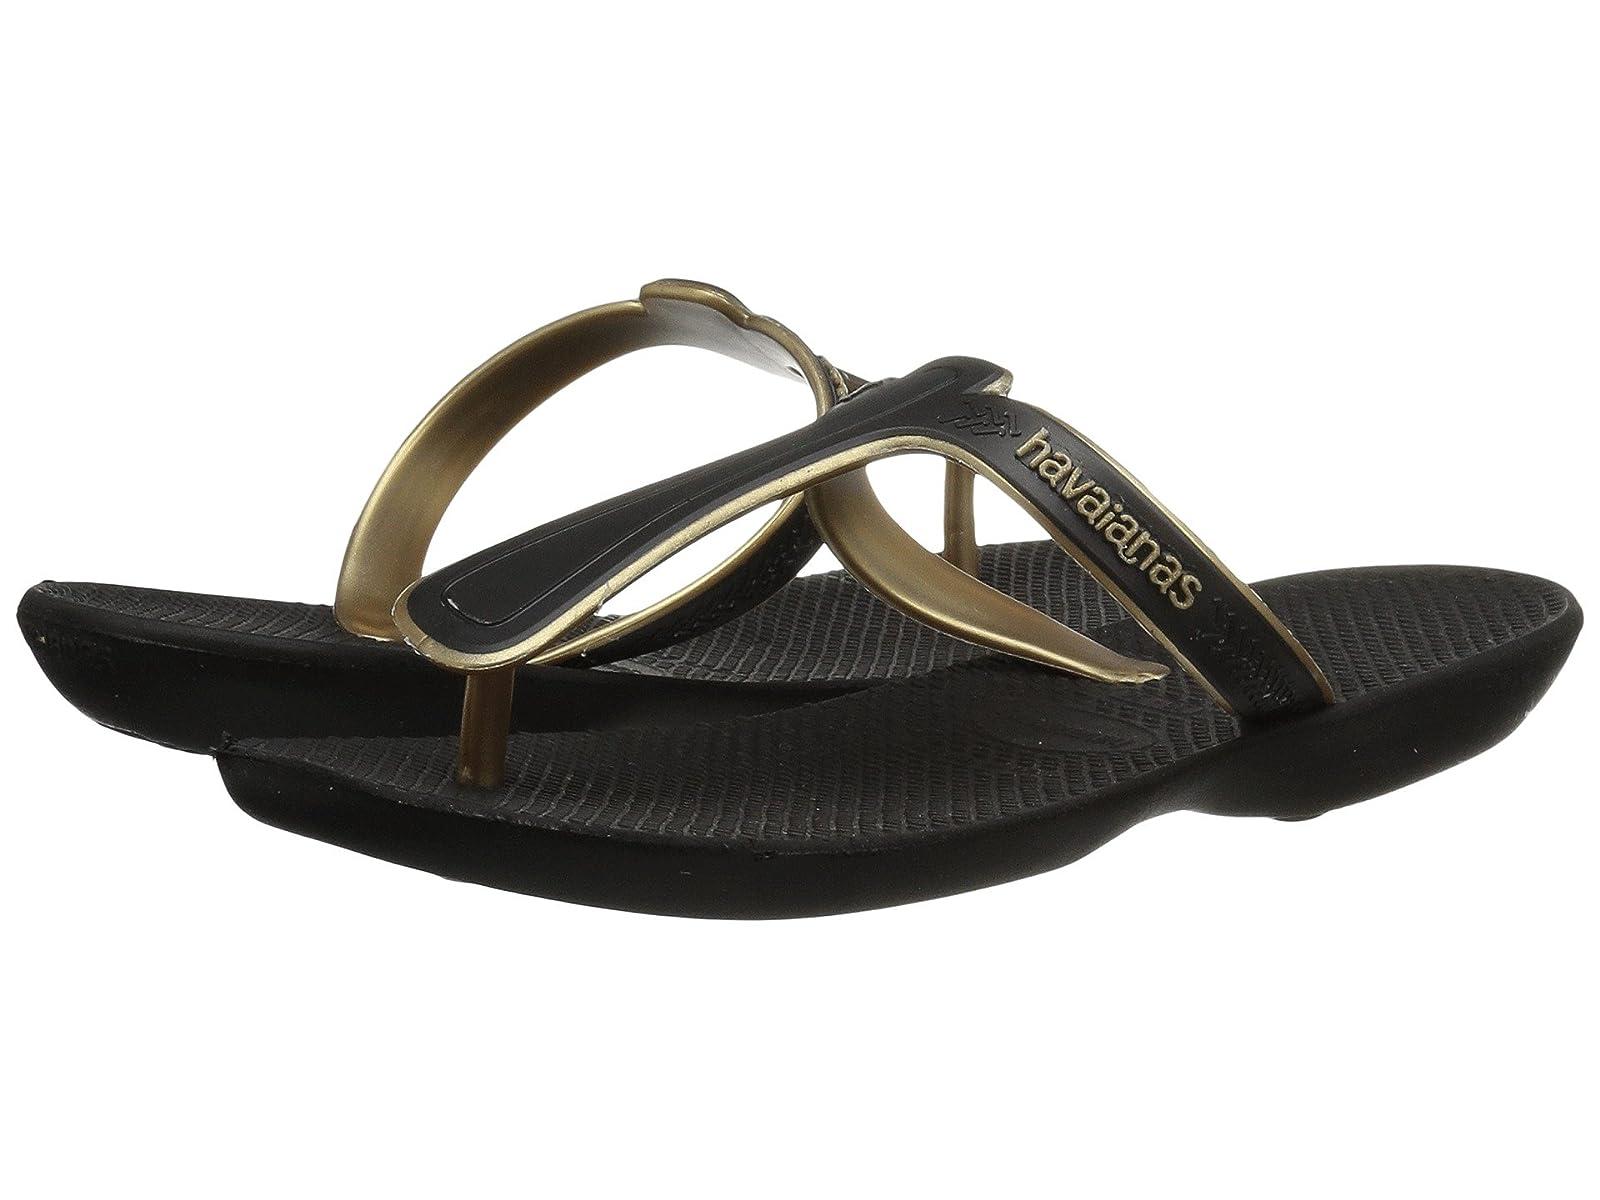 Havaianas Casual Flip-FlopsAtmospheric grades have affordable shoes